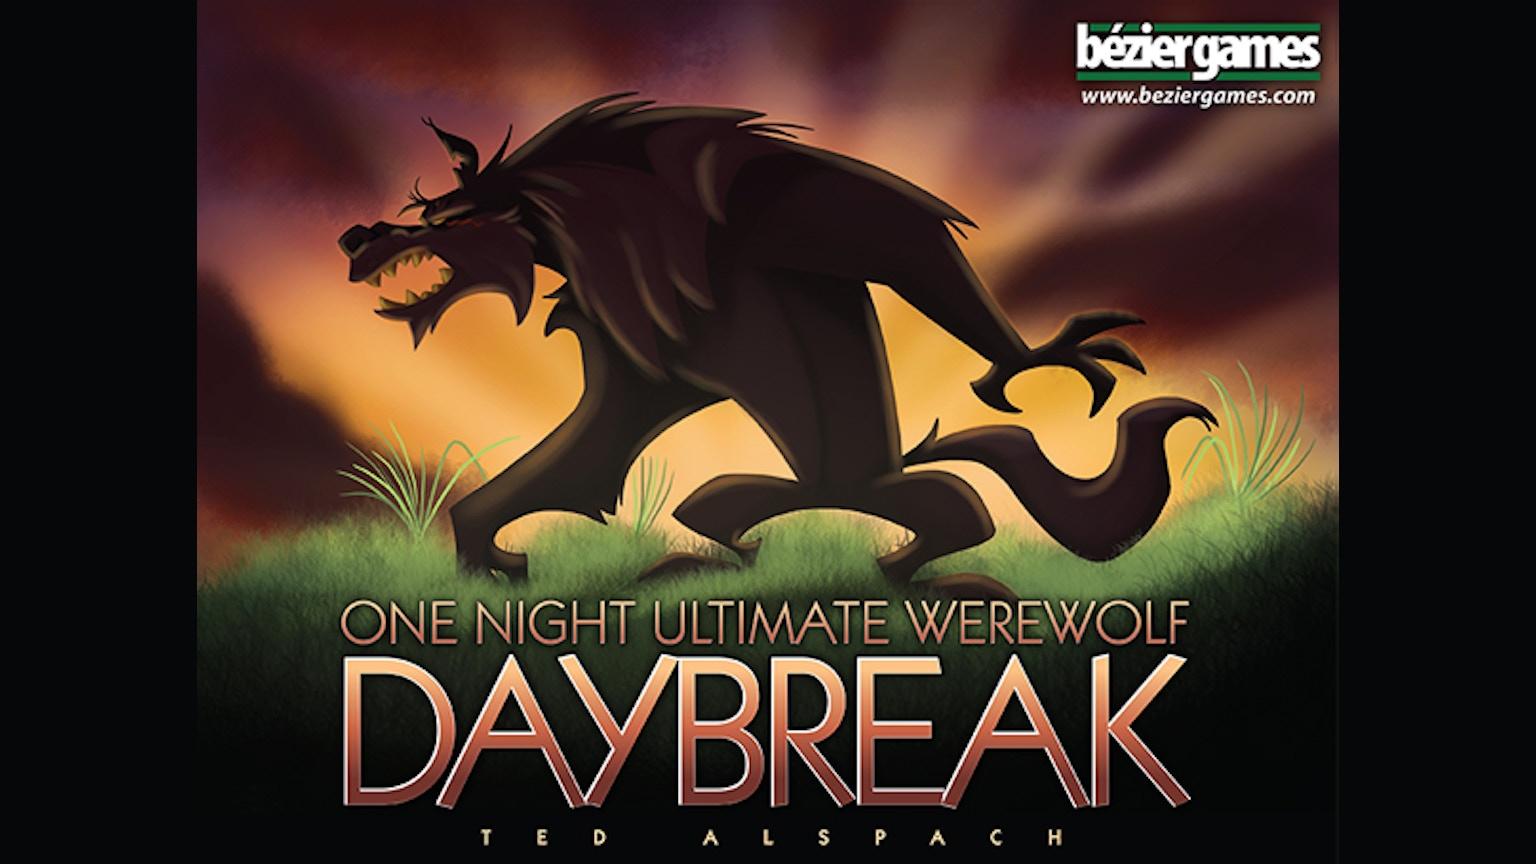 one night ultimate werewolf daybreak pdf